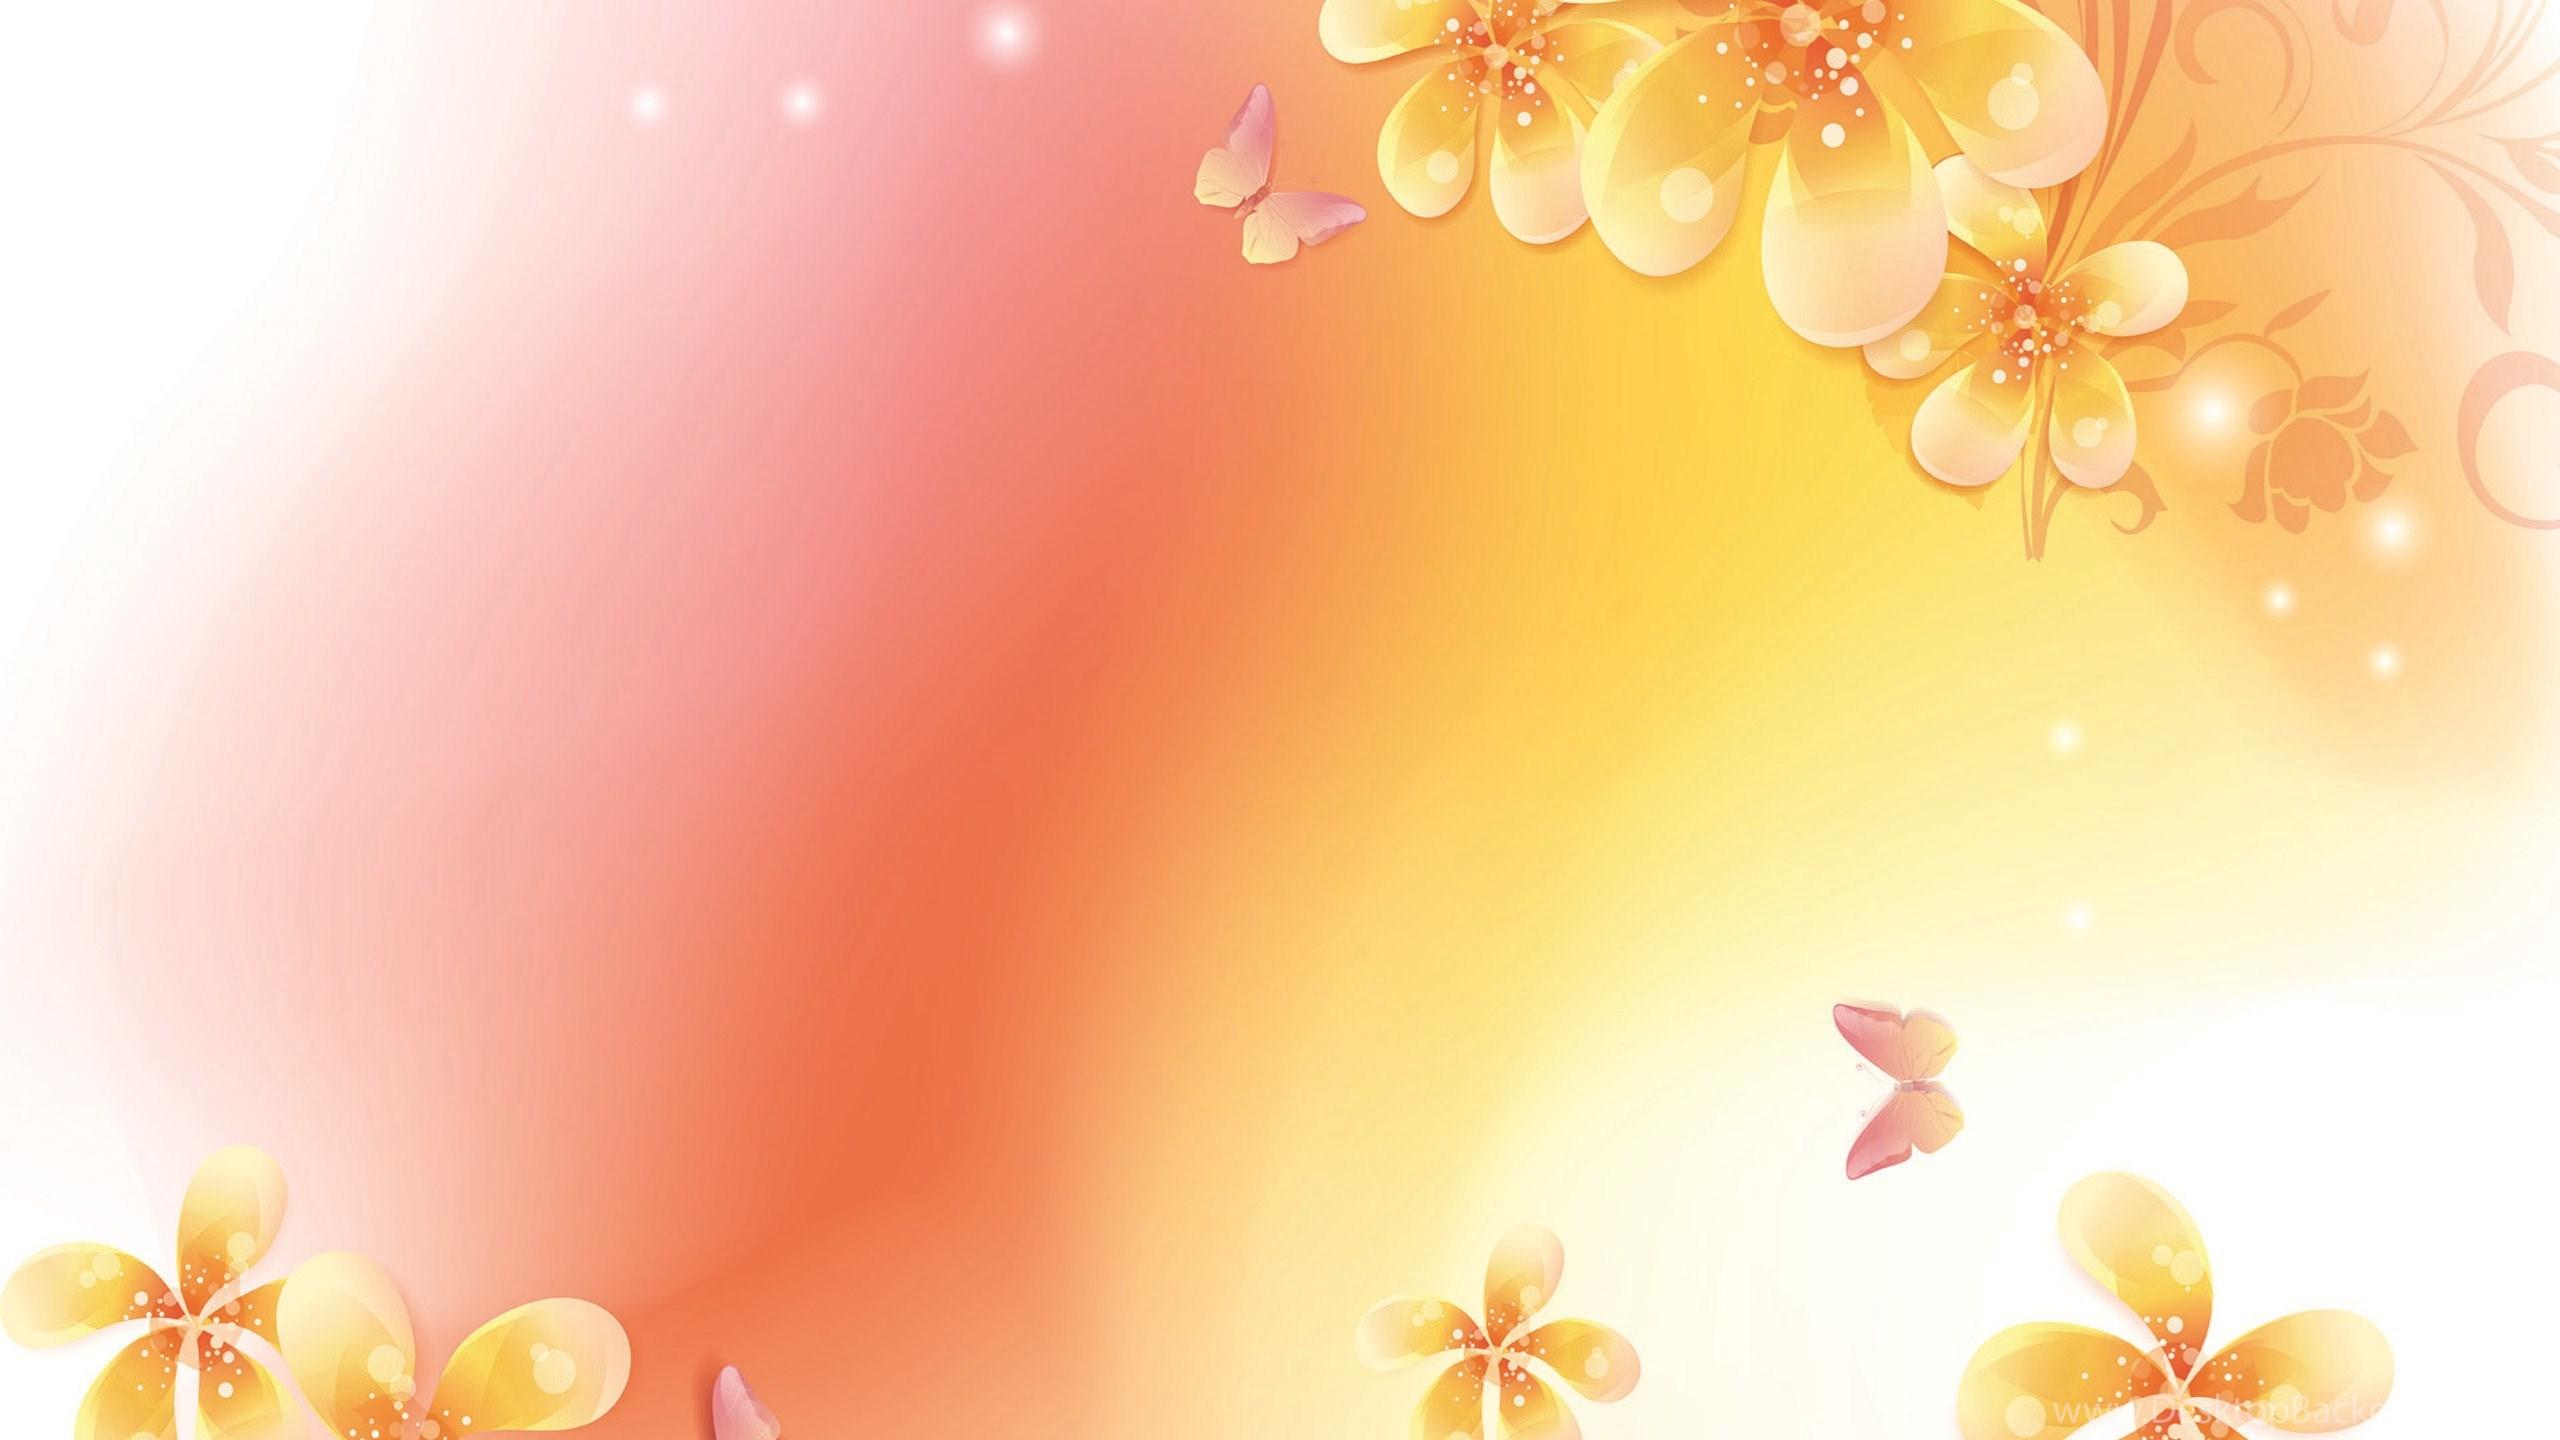 Elegant Abstract Pink Flowers Wallpapers Hd Hd Desktop Wallpapers